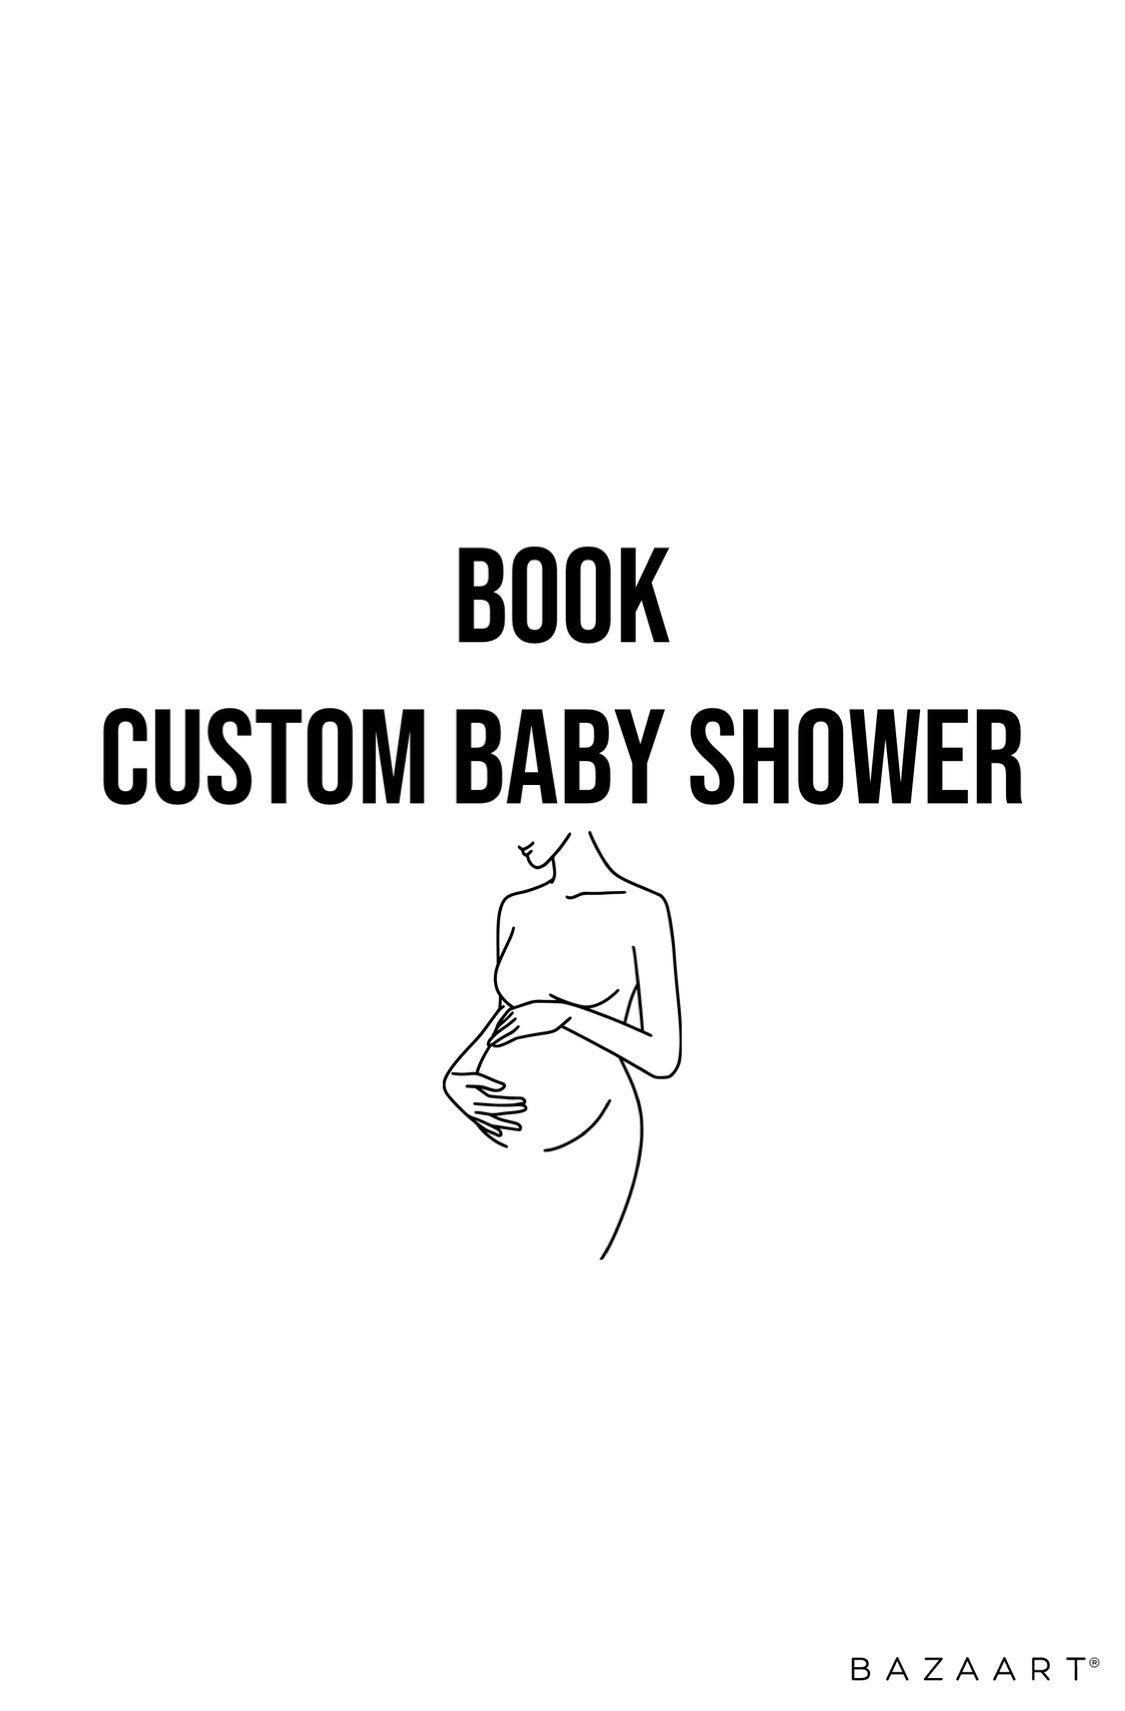 Custom Baby Shower